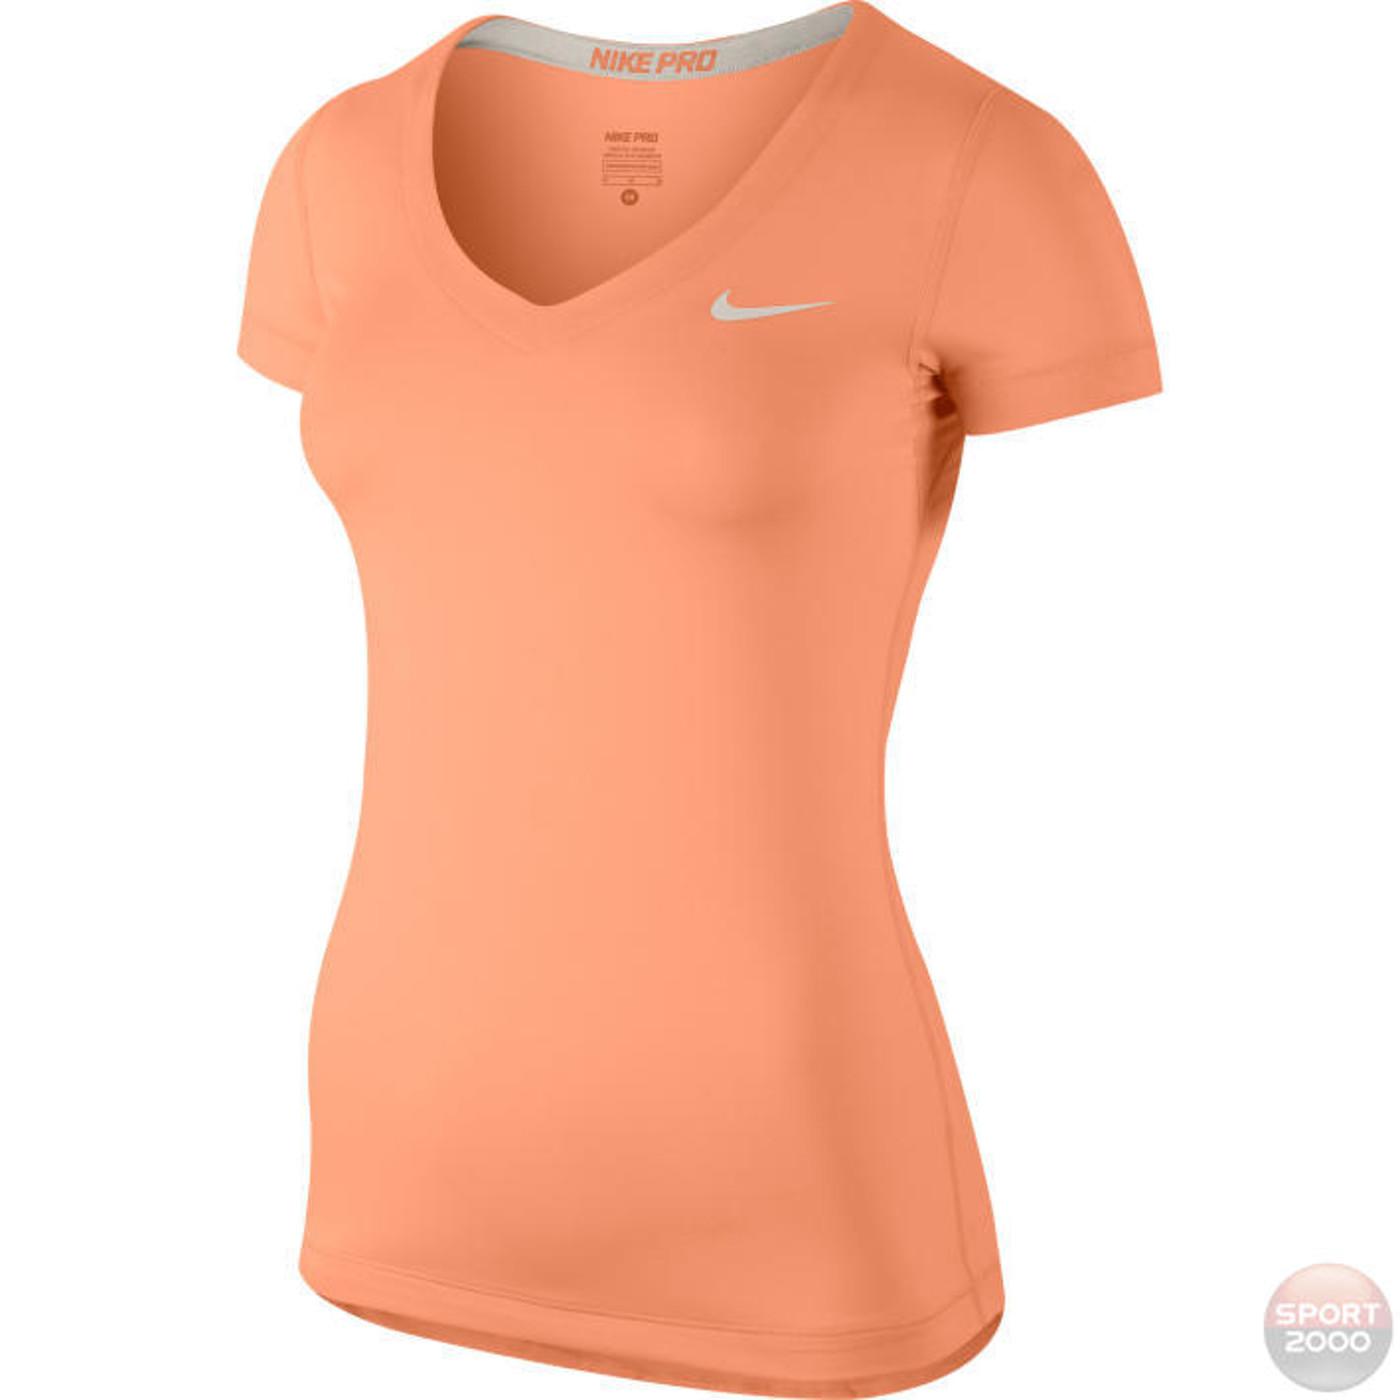 NIKE MO FIT Shirt PRO V-NECK - Damen